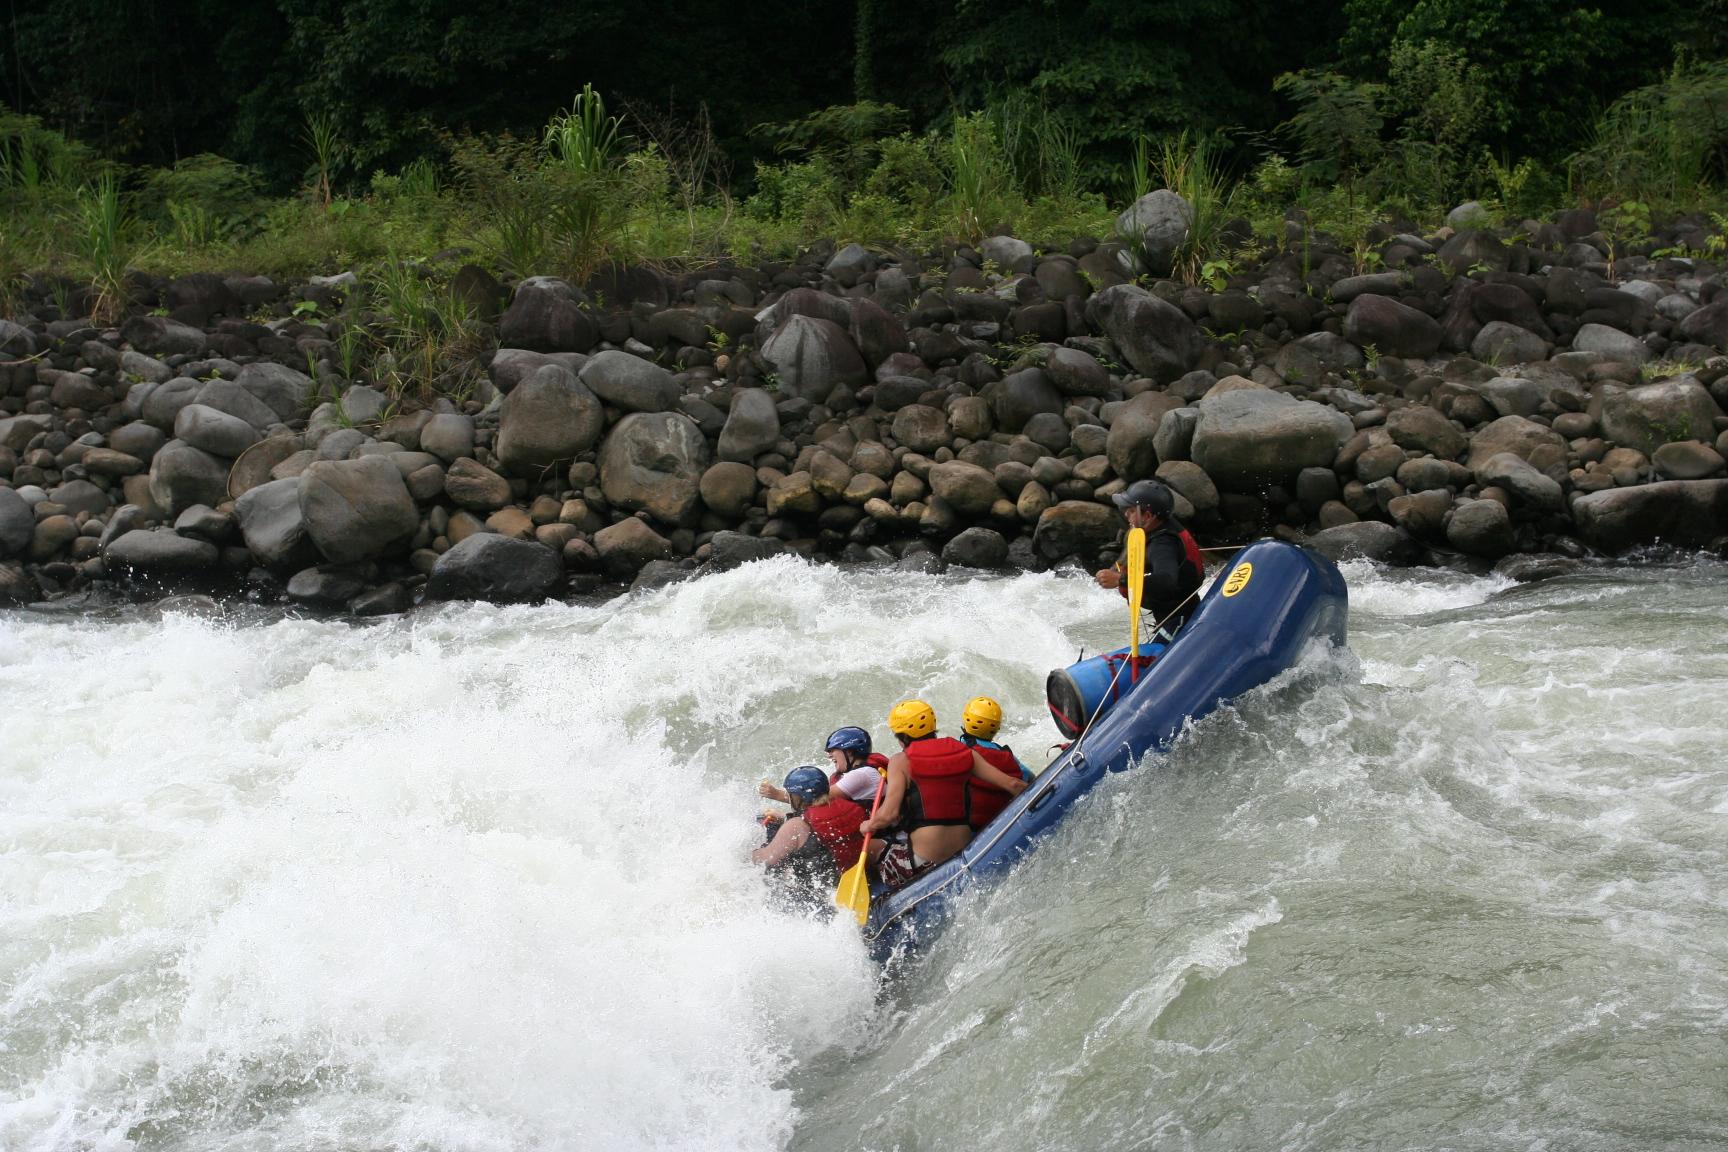 Rafting in Bali: White Water, Big Adventure